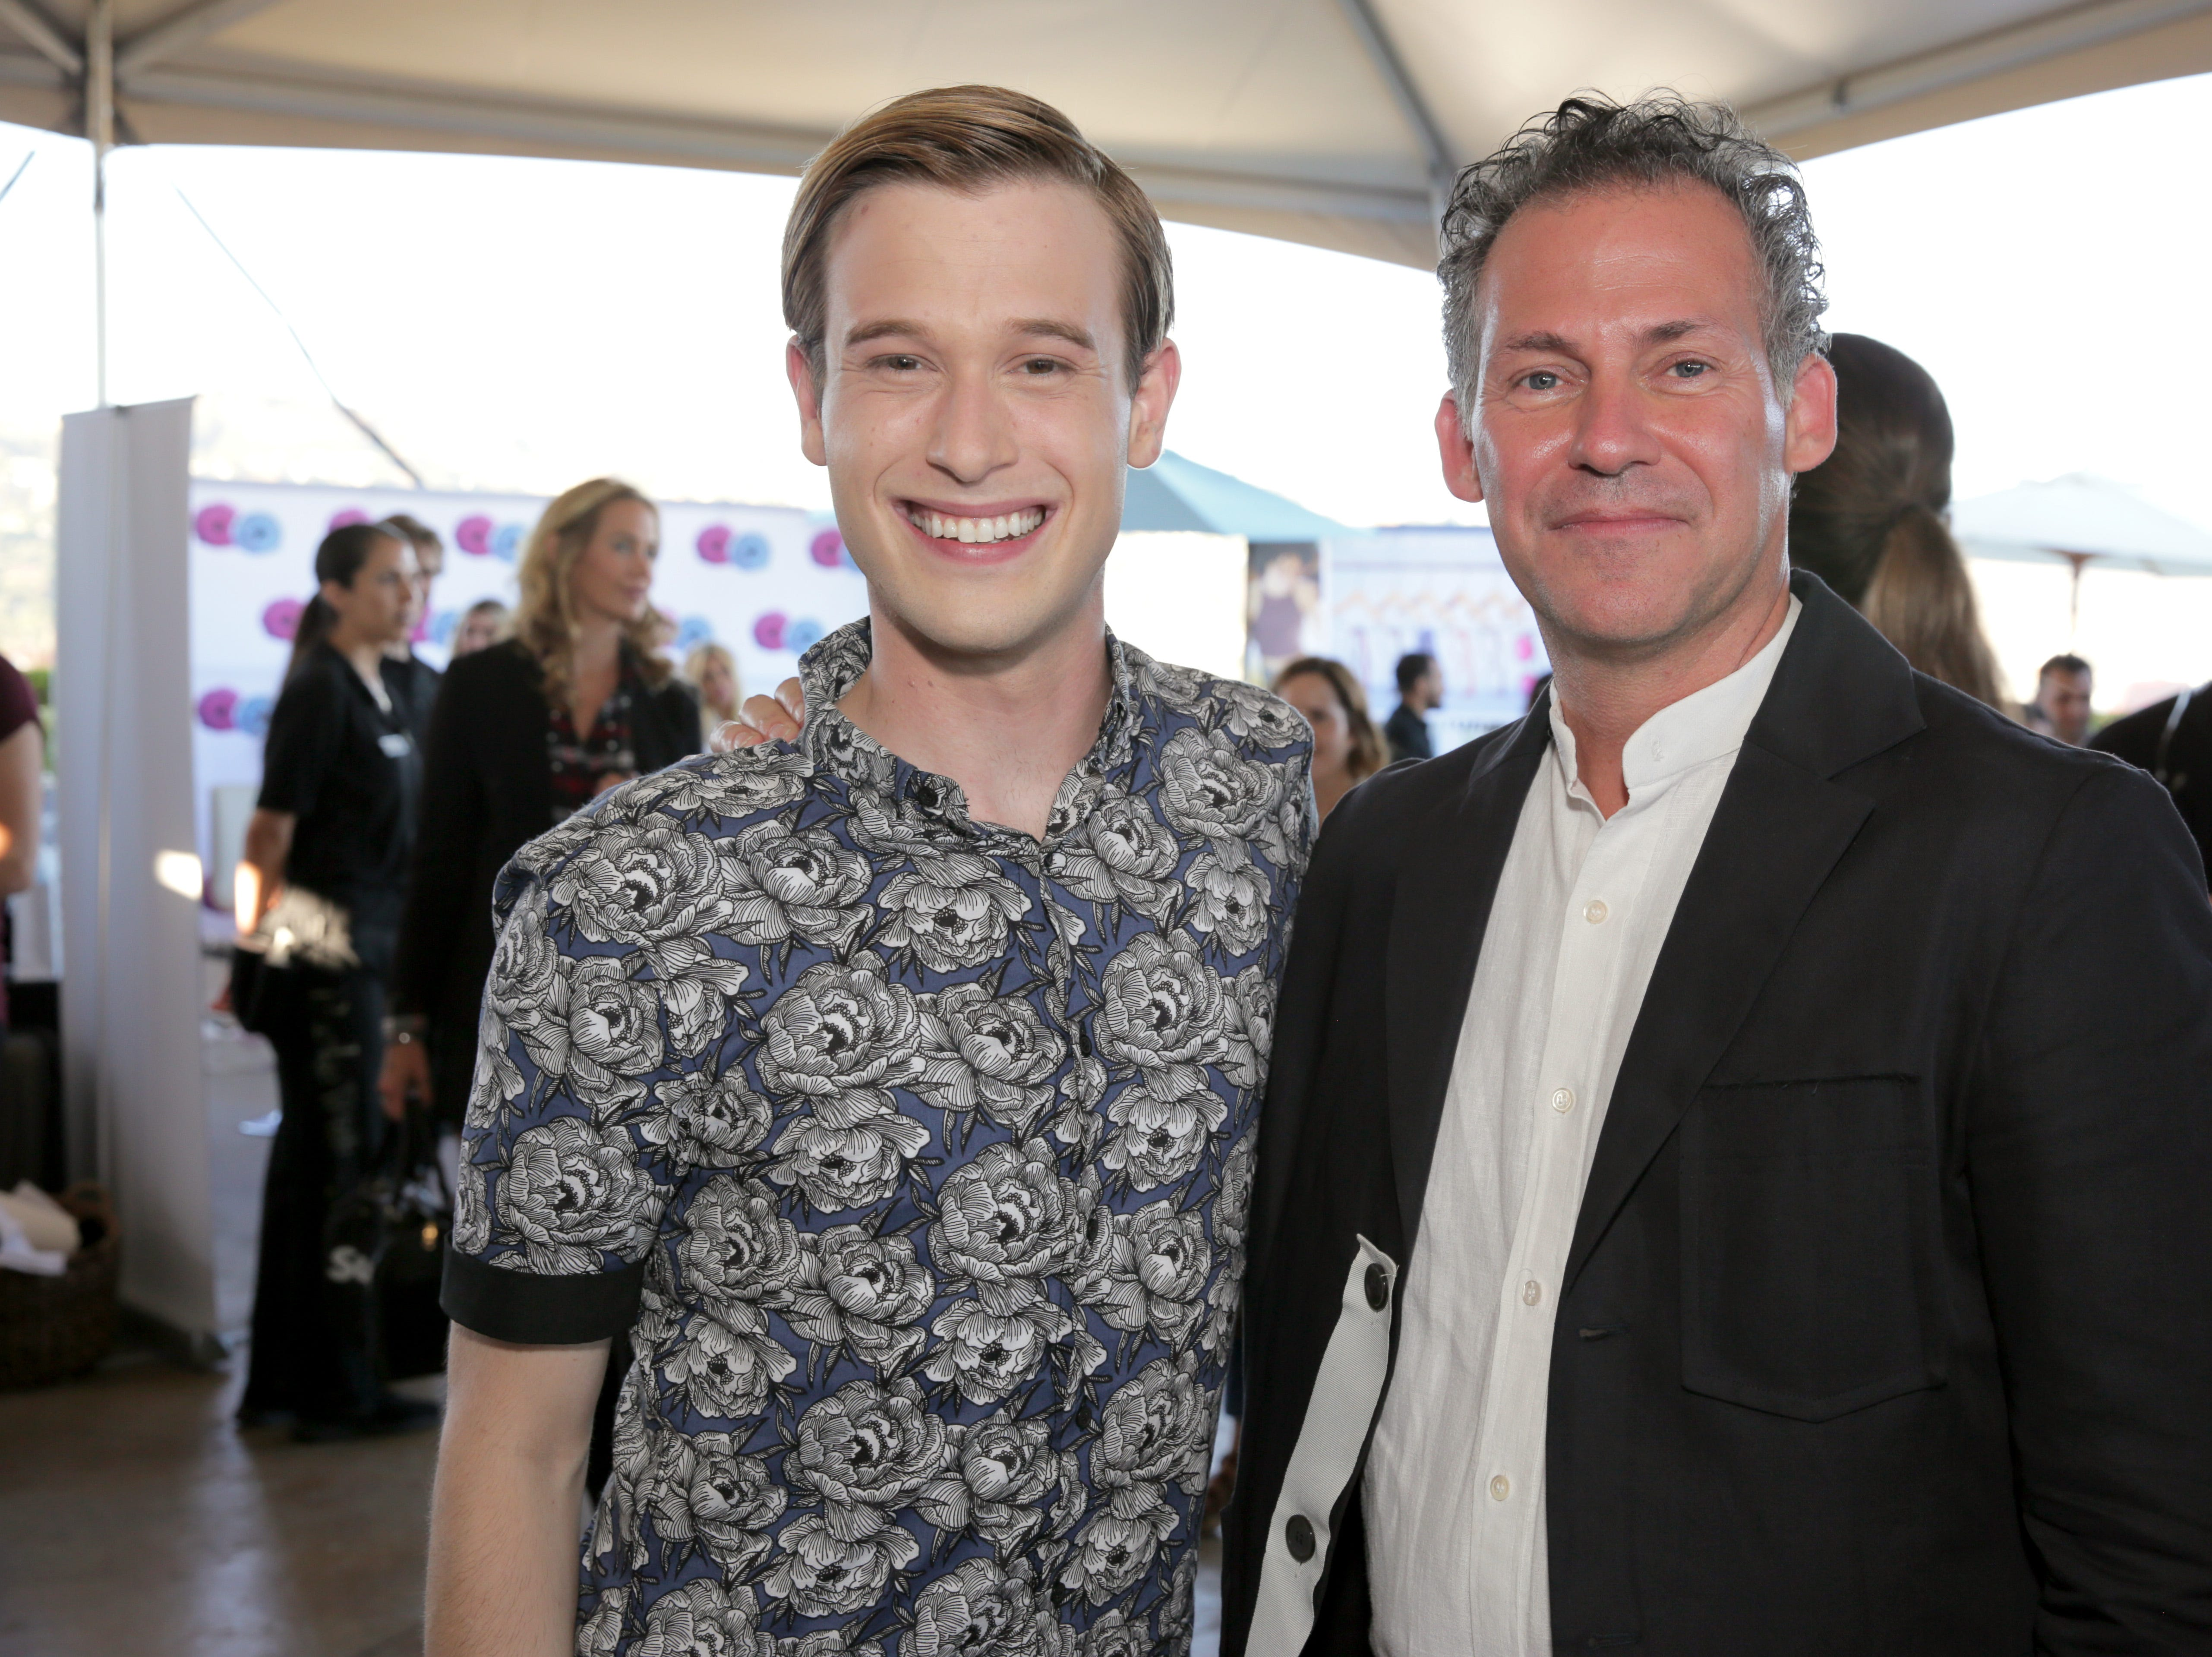 Tyler Henry (left) and Gavin Keilly of GBK attend Pilot Pen & GBK Celebration Lounge on Sept. 14, 2018, in Beverly Hills, California